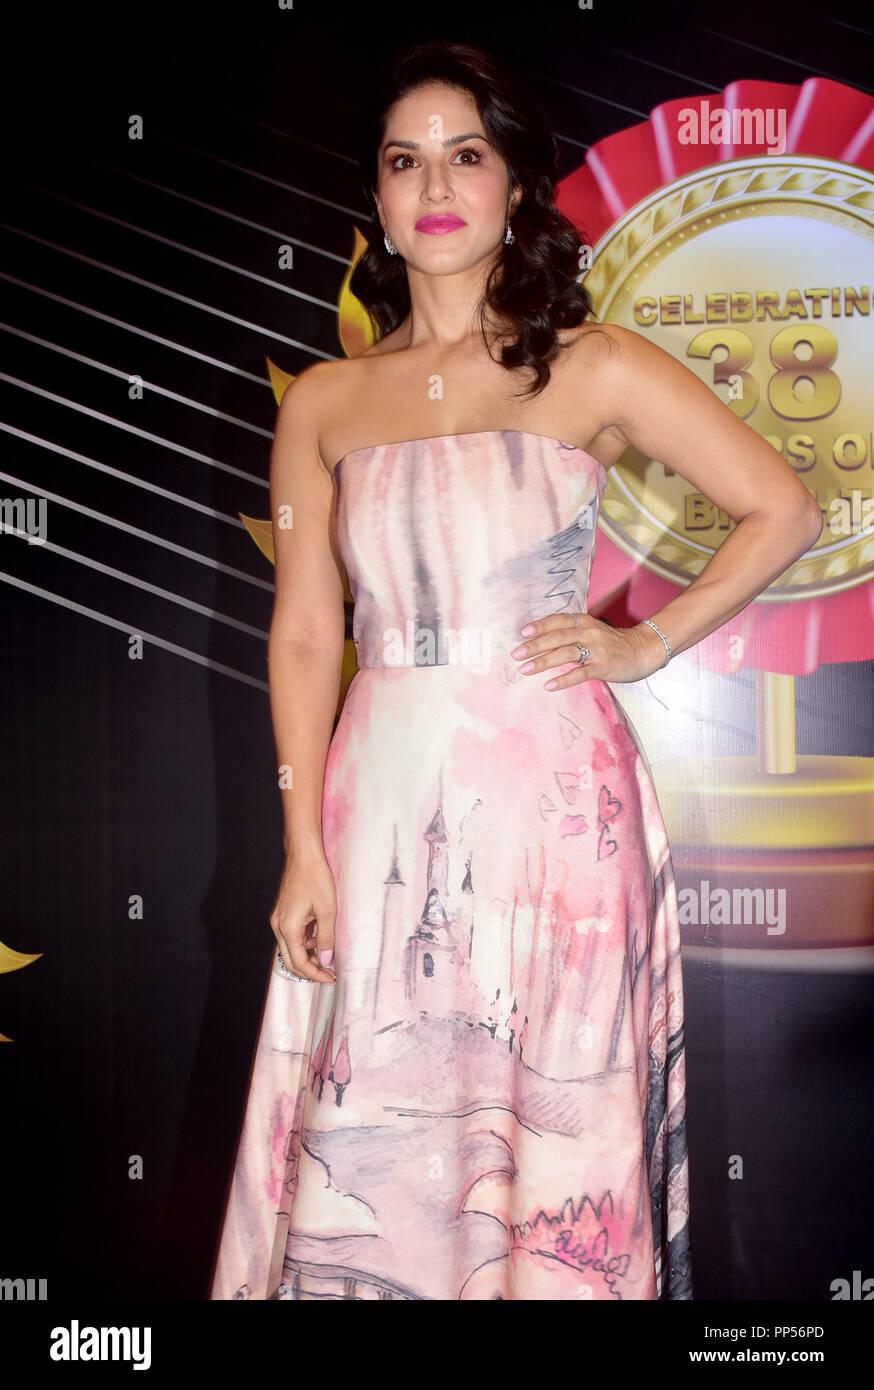 American Canadian Indian Actress Sunny